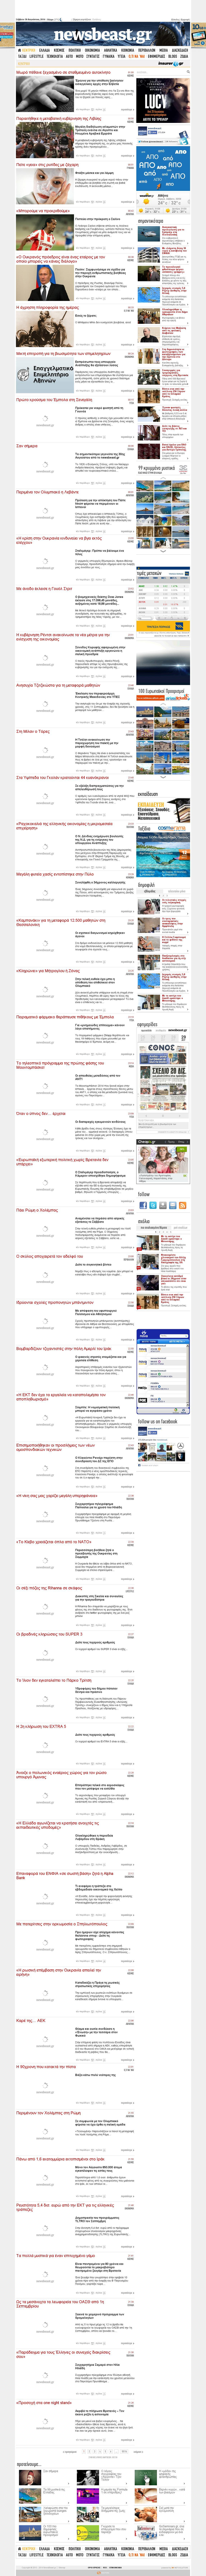 News Beast at Friday Aug. 29, 2014, 10:11 p.m. UTC